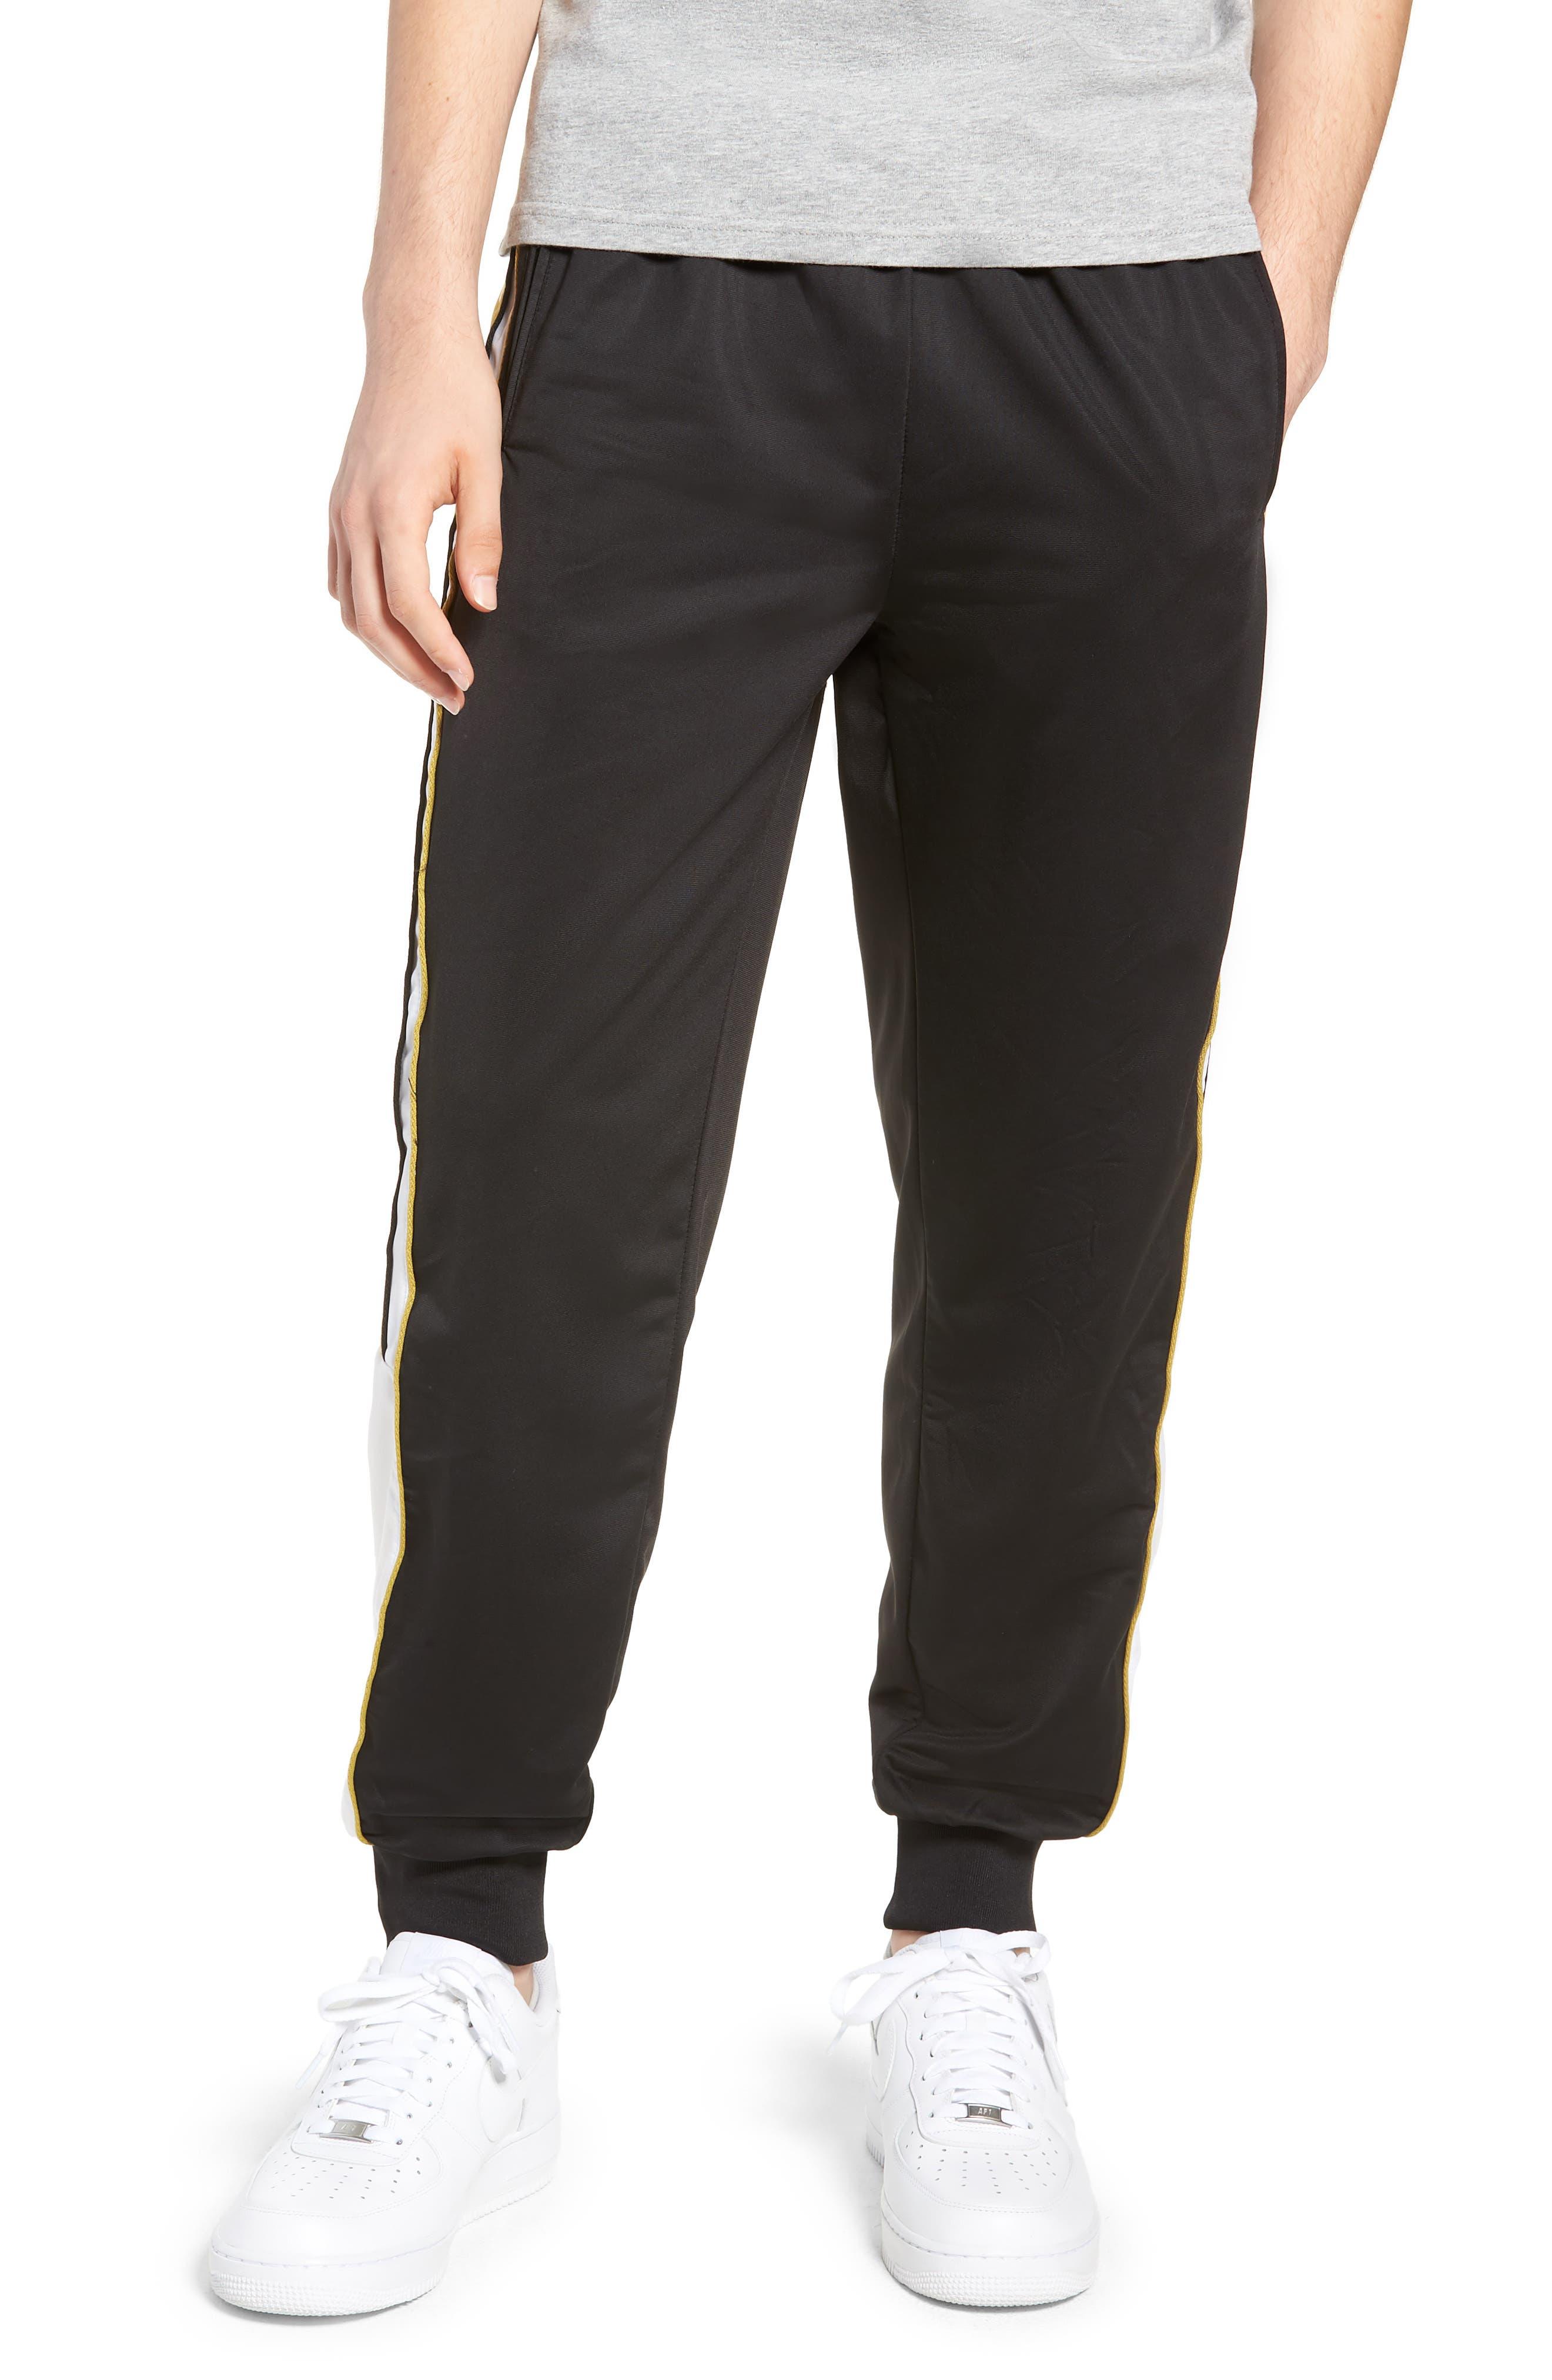 10 Alen Track Pants,                             Main thumbnail 1, color,                             001